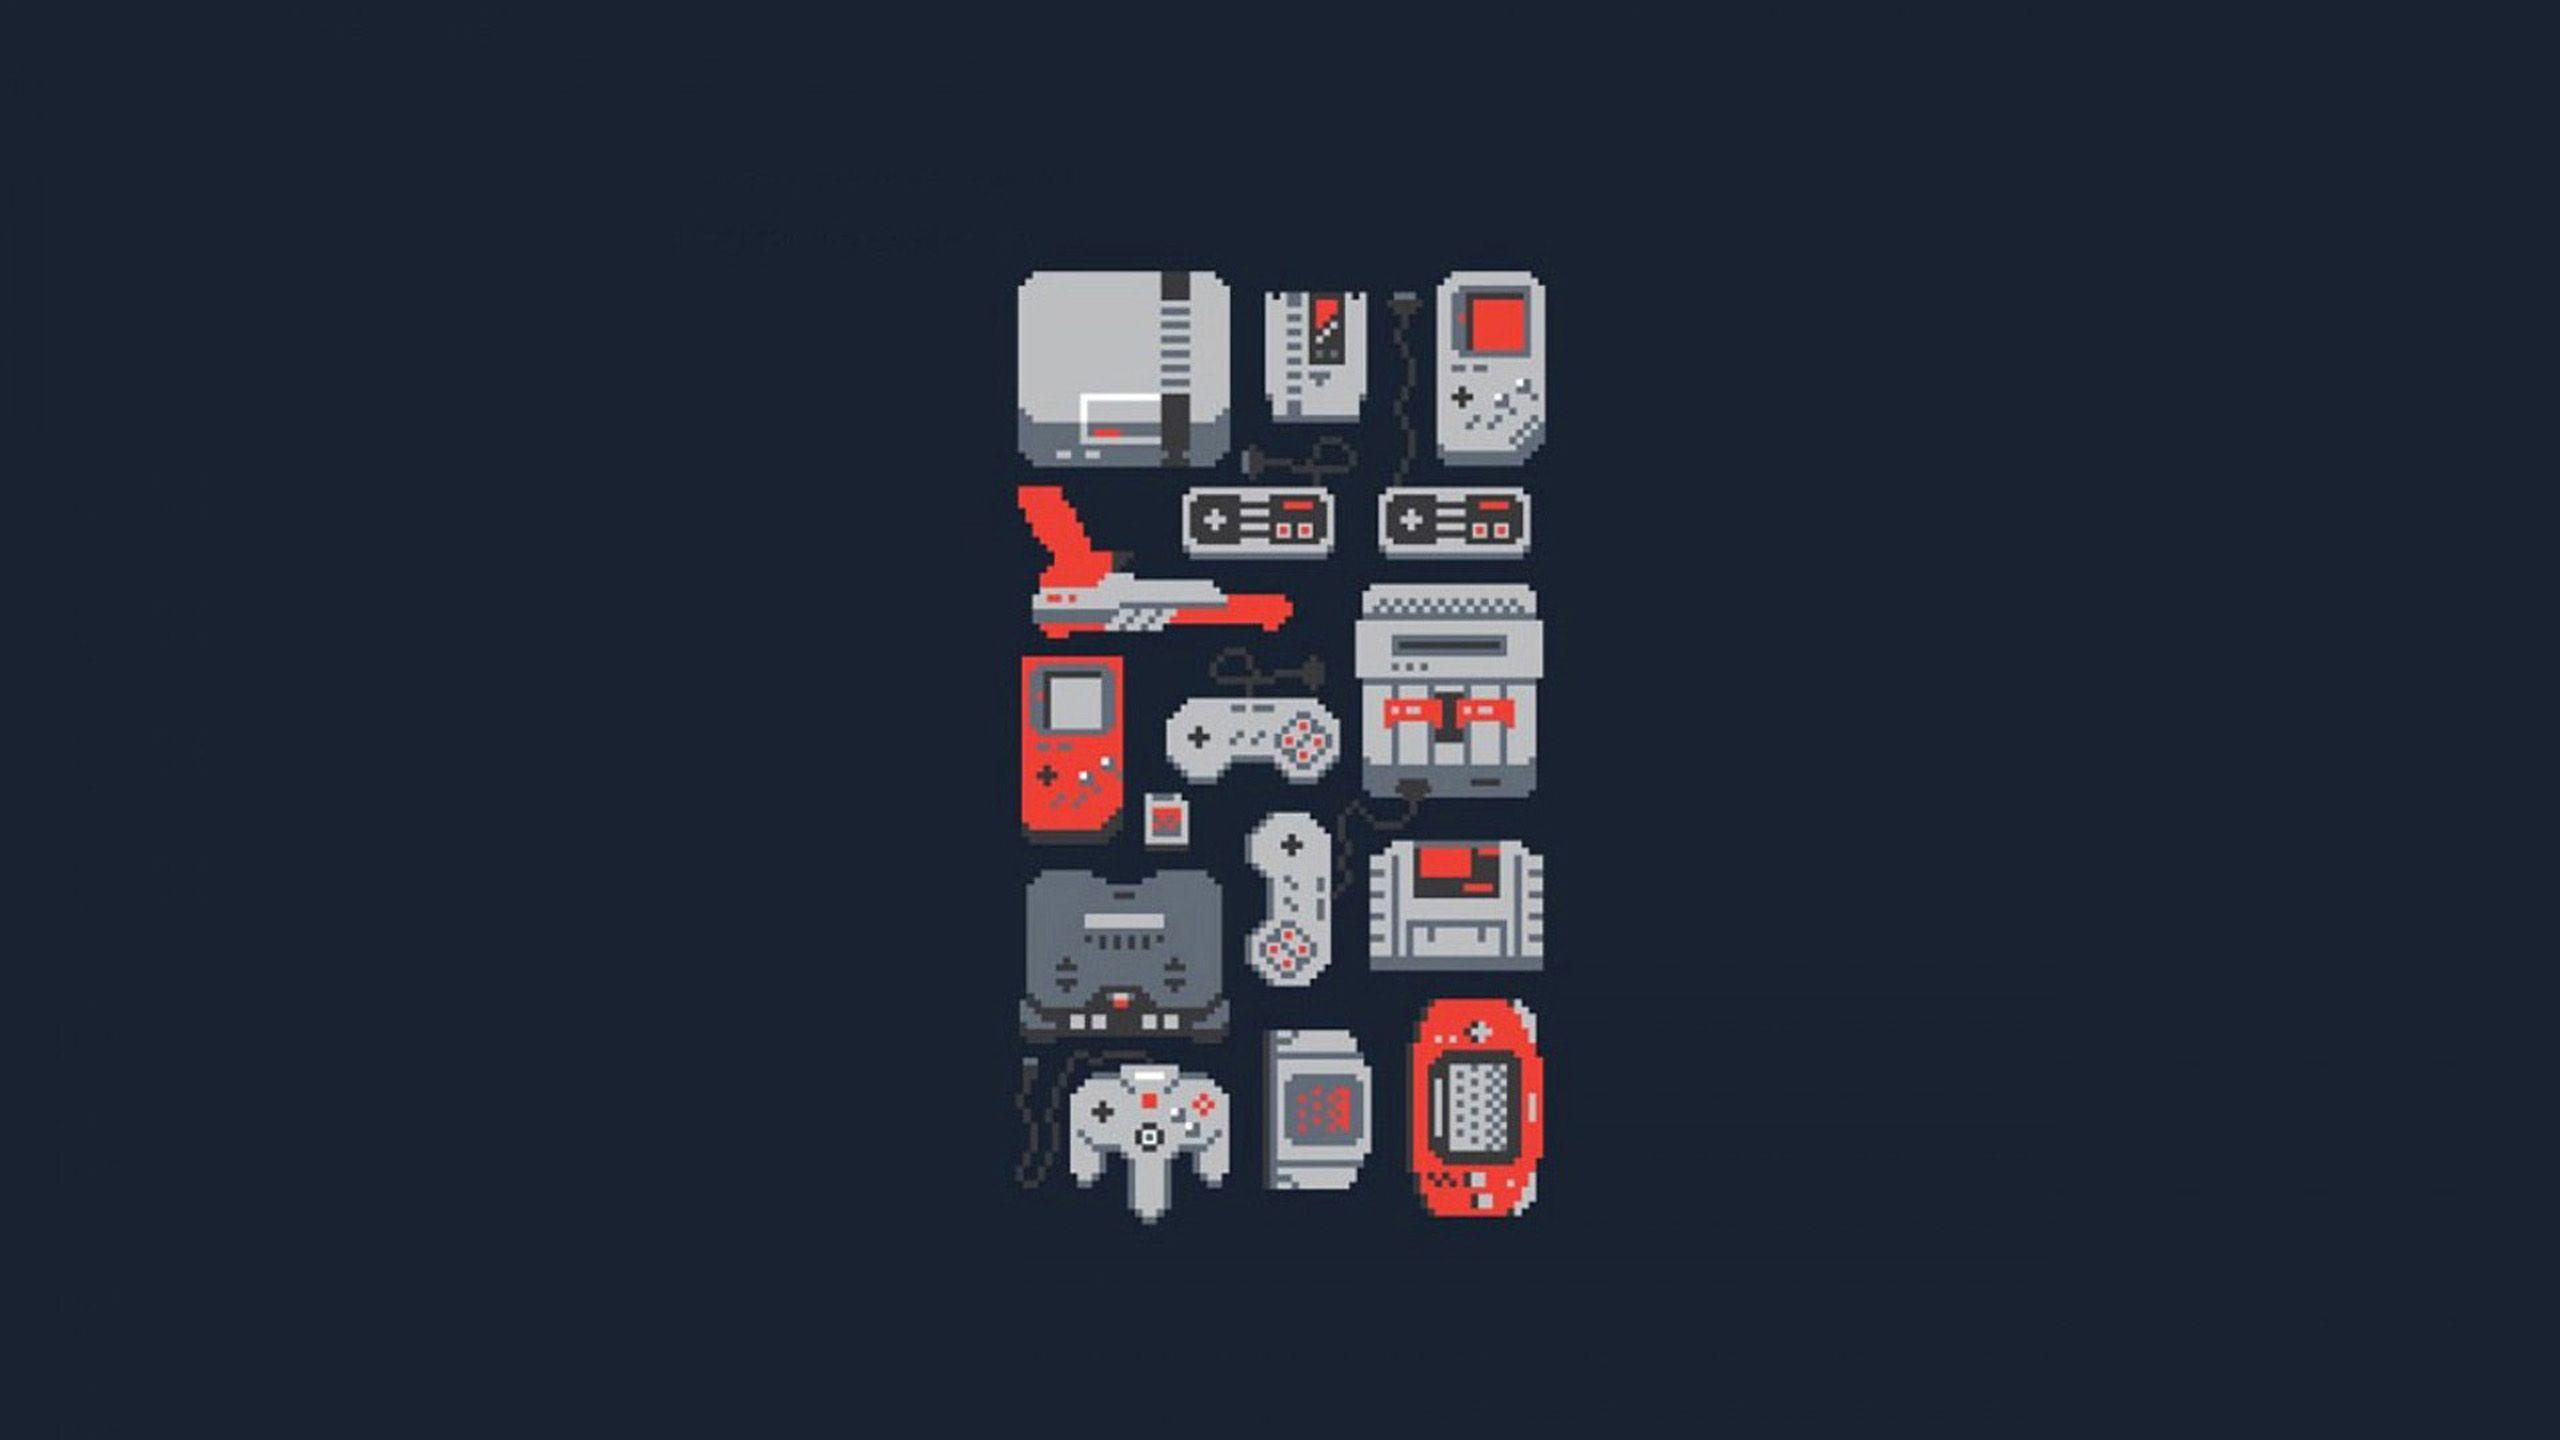 Retro Game Wallpapers K293QHS 8613 Kb   Picseriocom 2560x1440